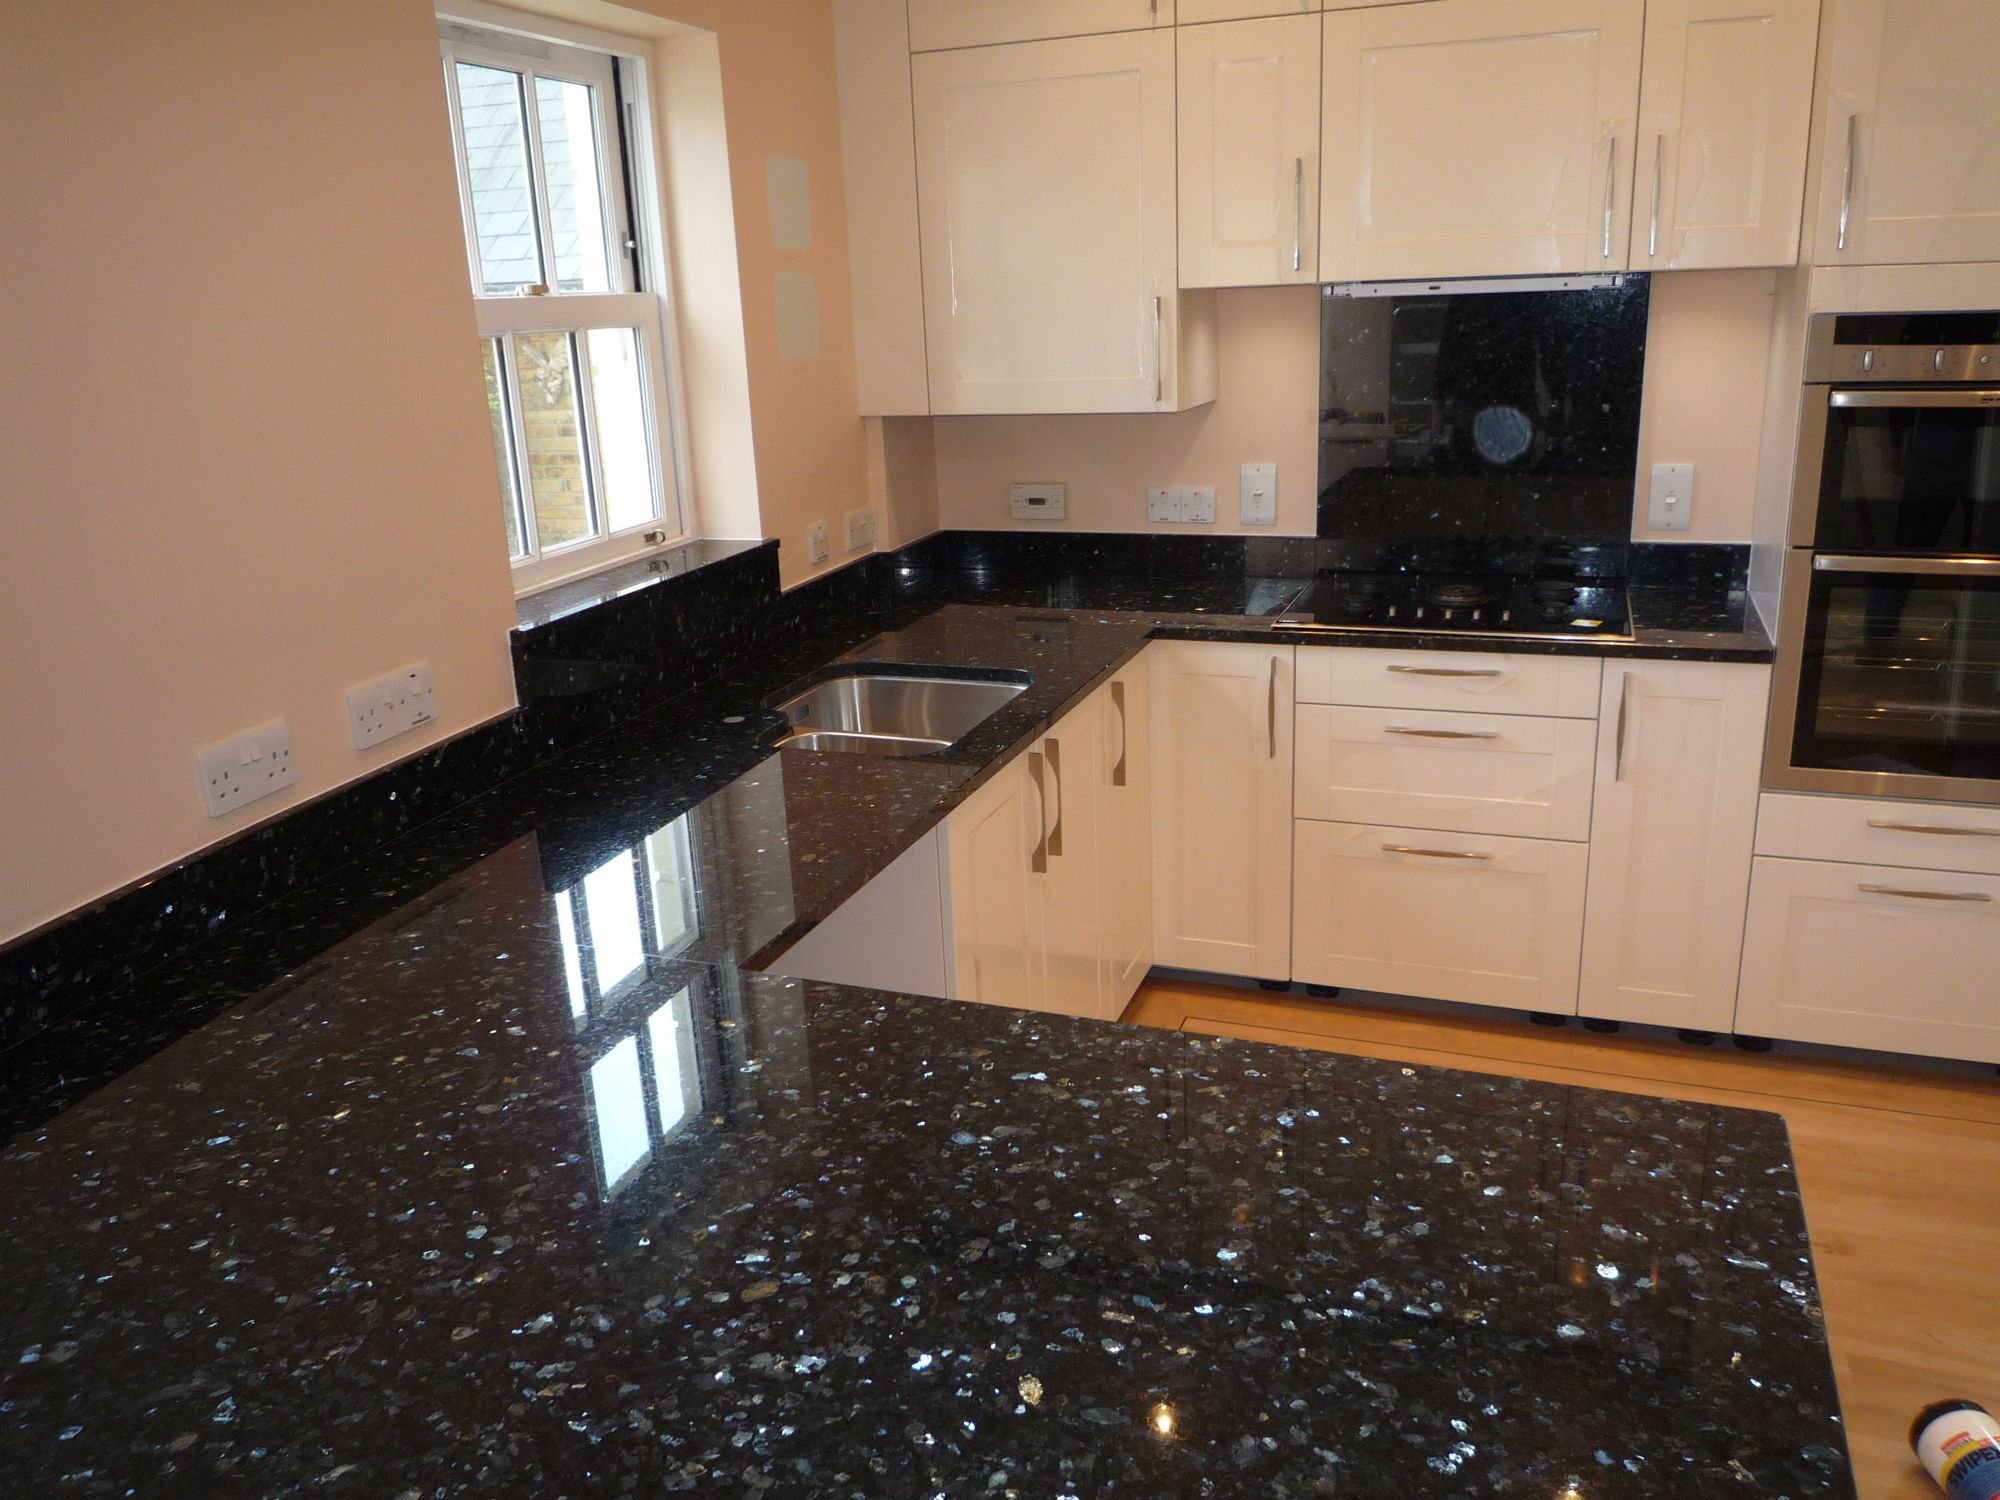 White kitchen cabinets with emerald pearl granite - Granite Worktops Countertops From Shaw Stone Hampshire